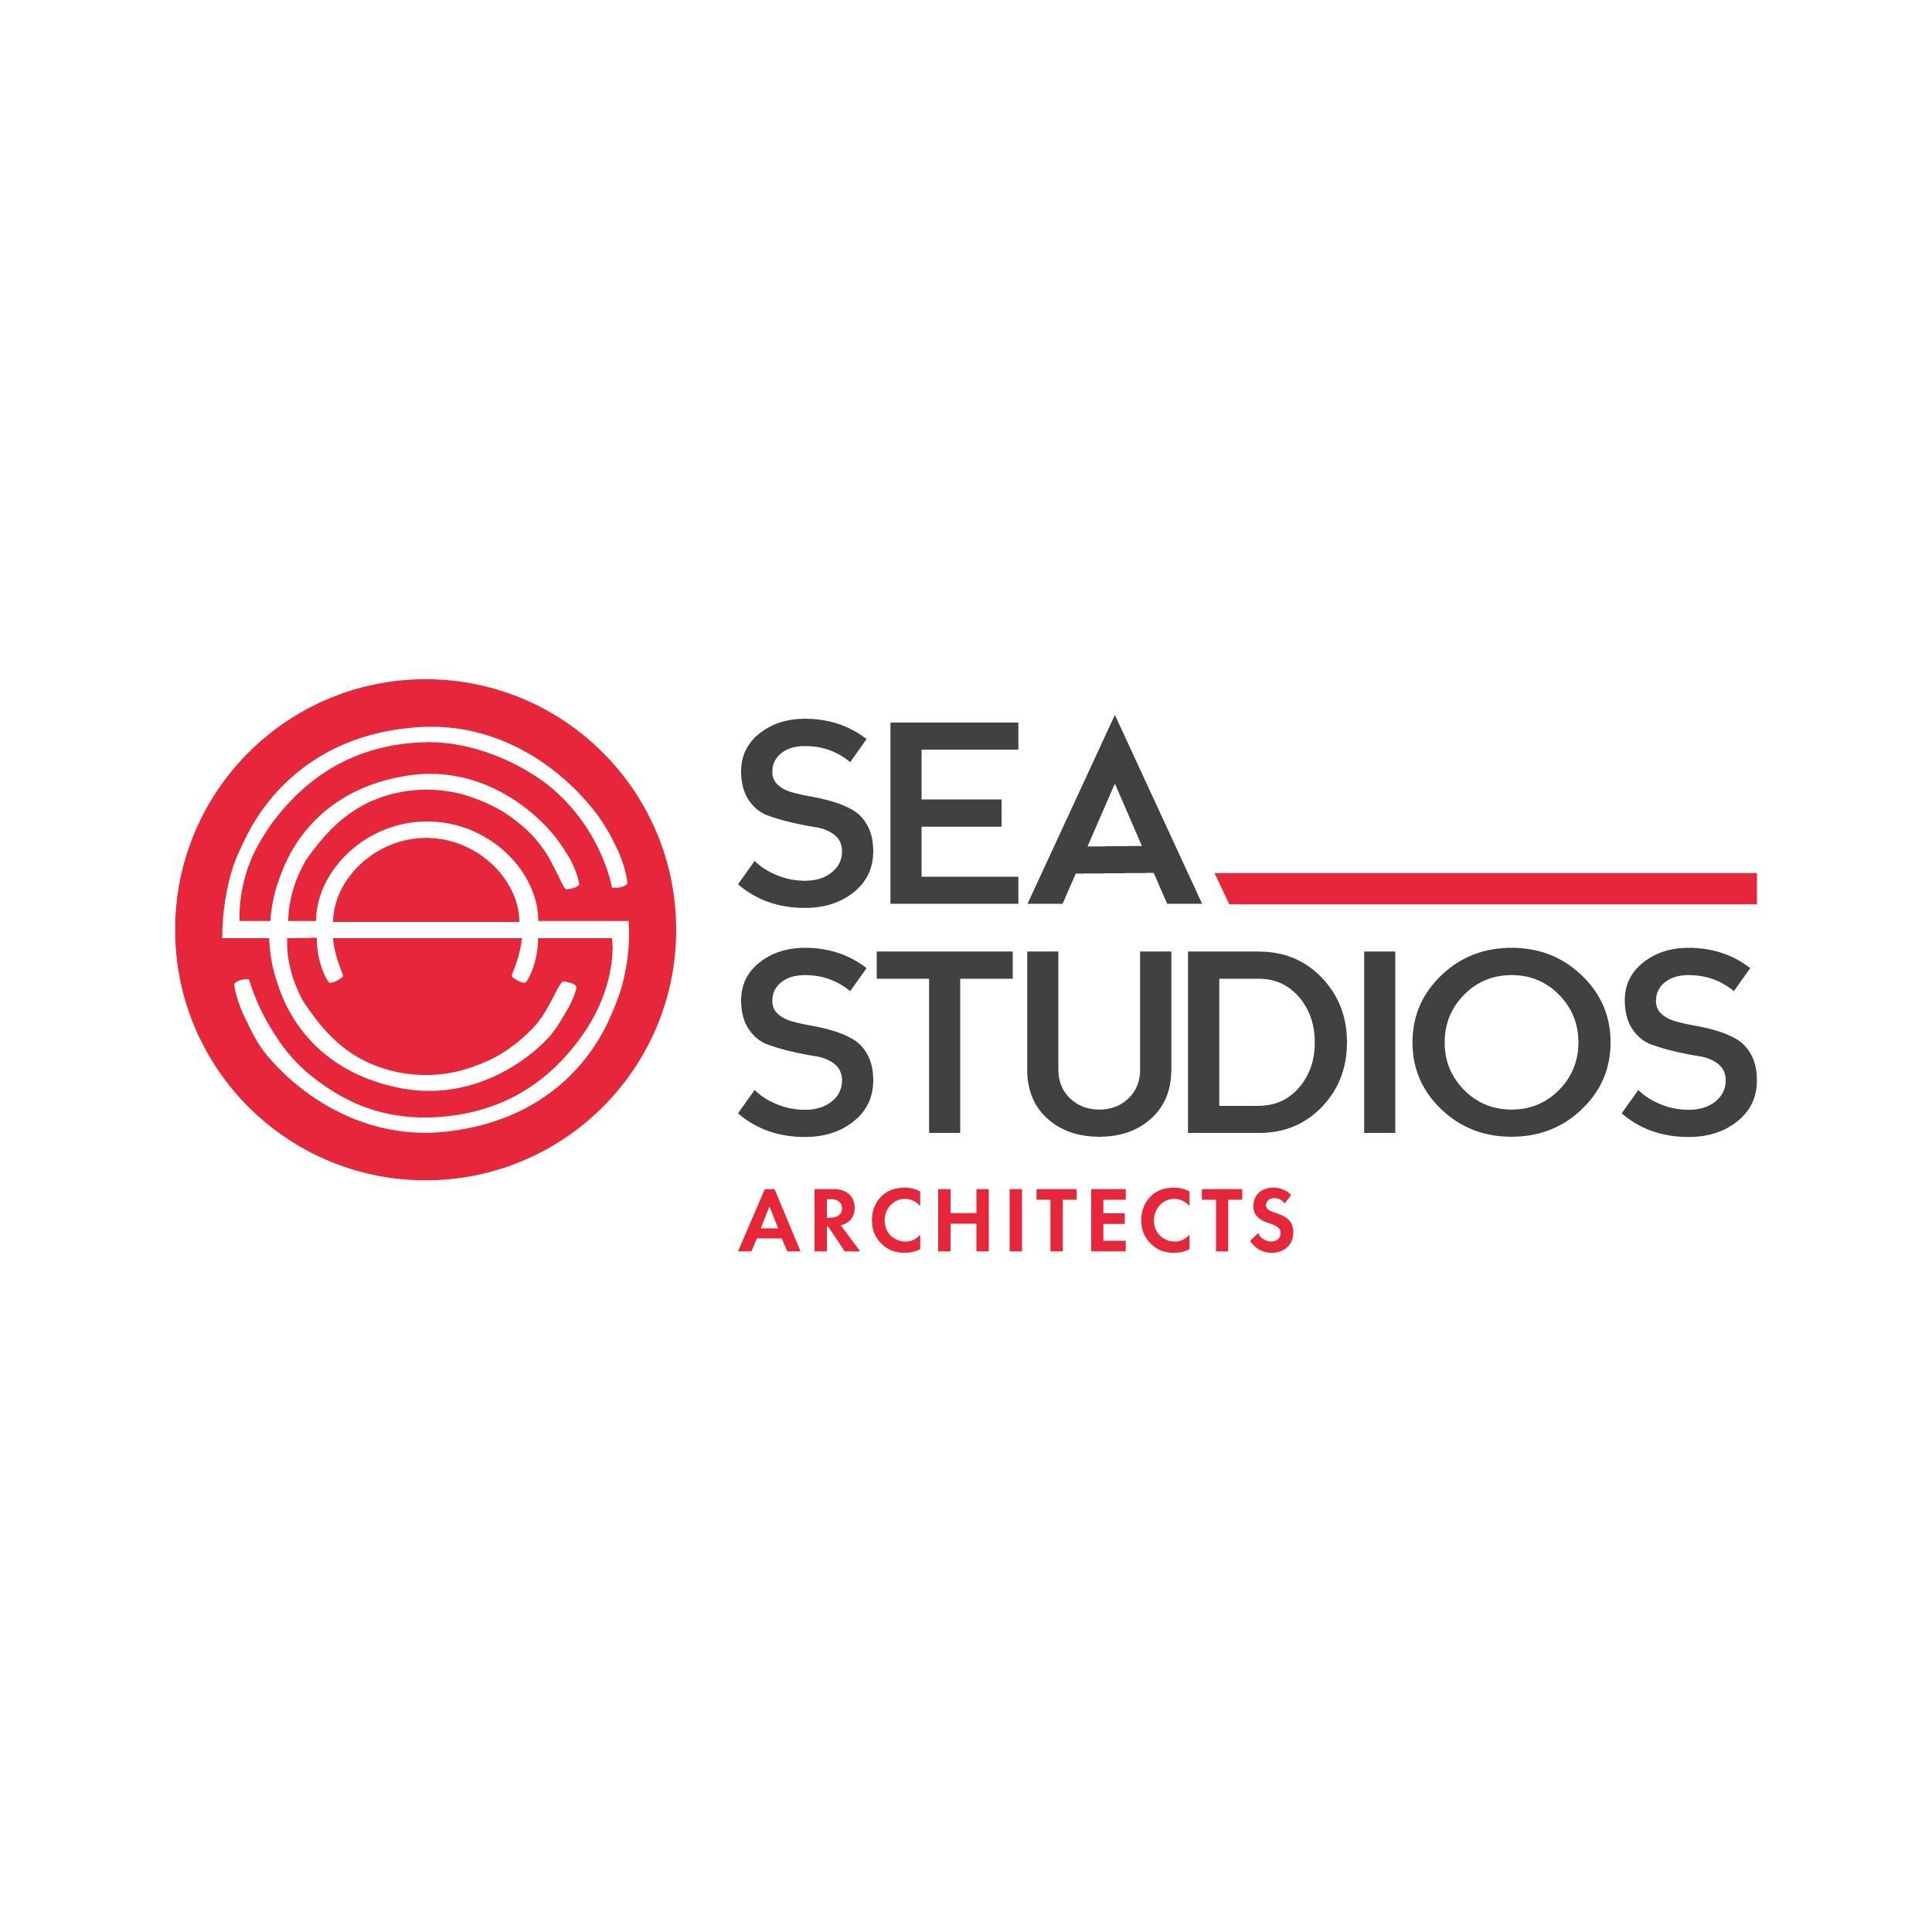 SEA Studios